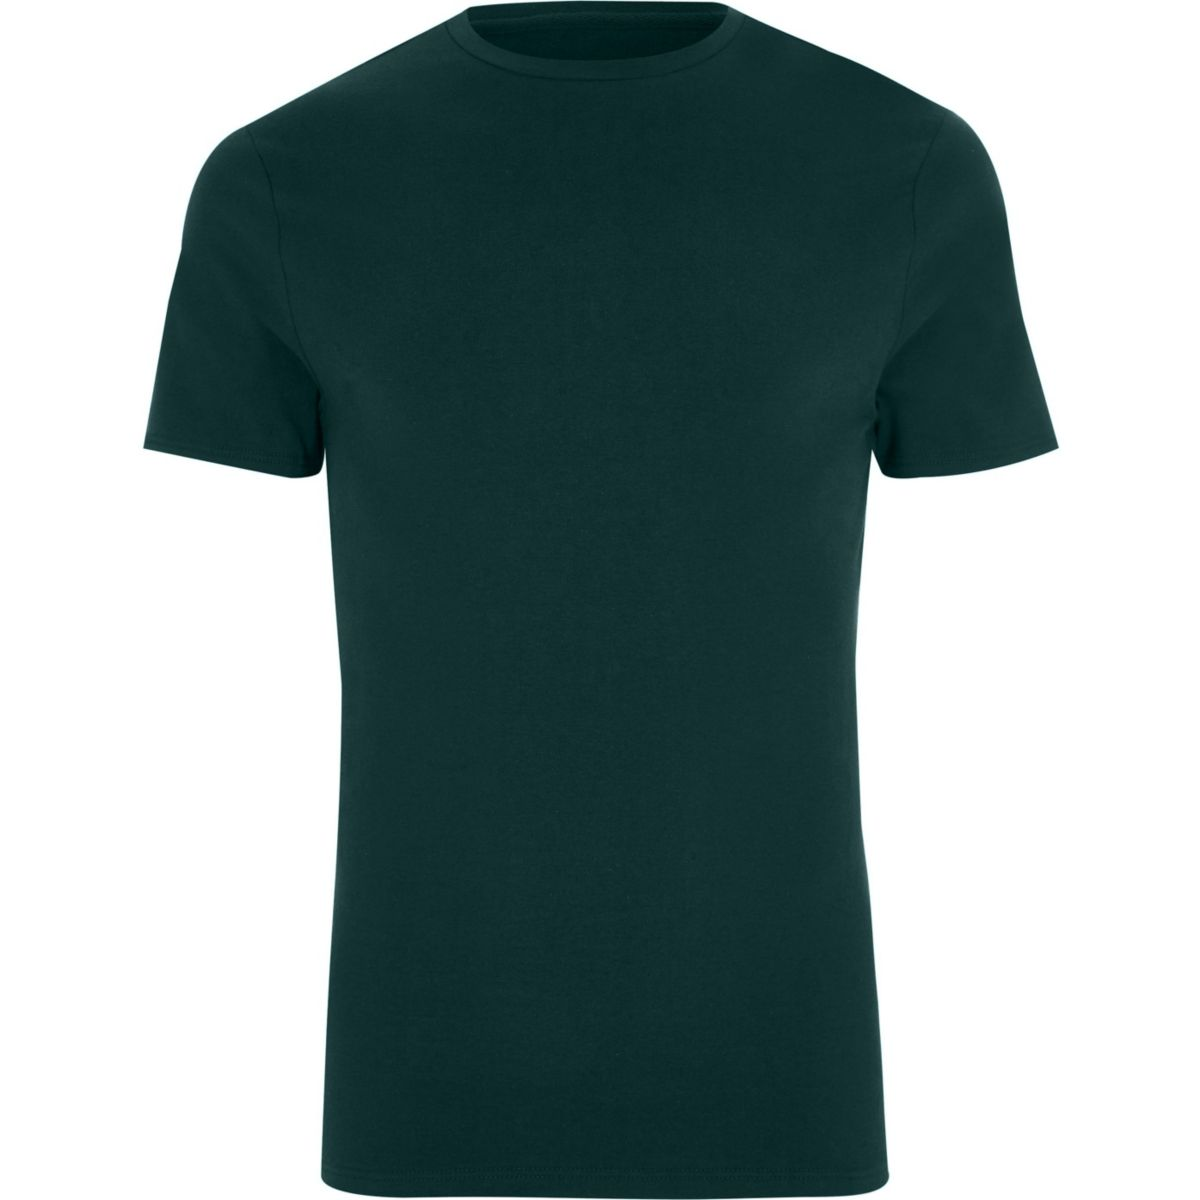 Big and Tall dark green T-shirt